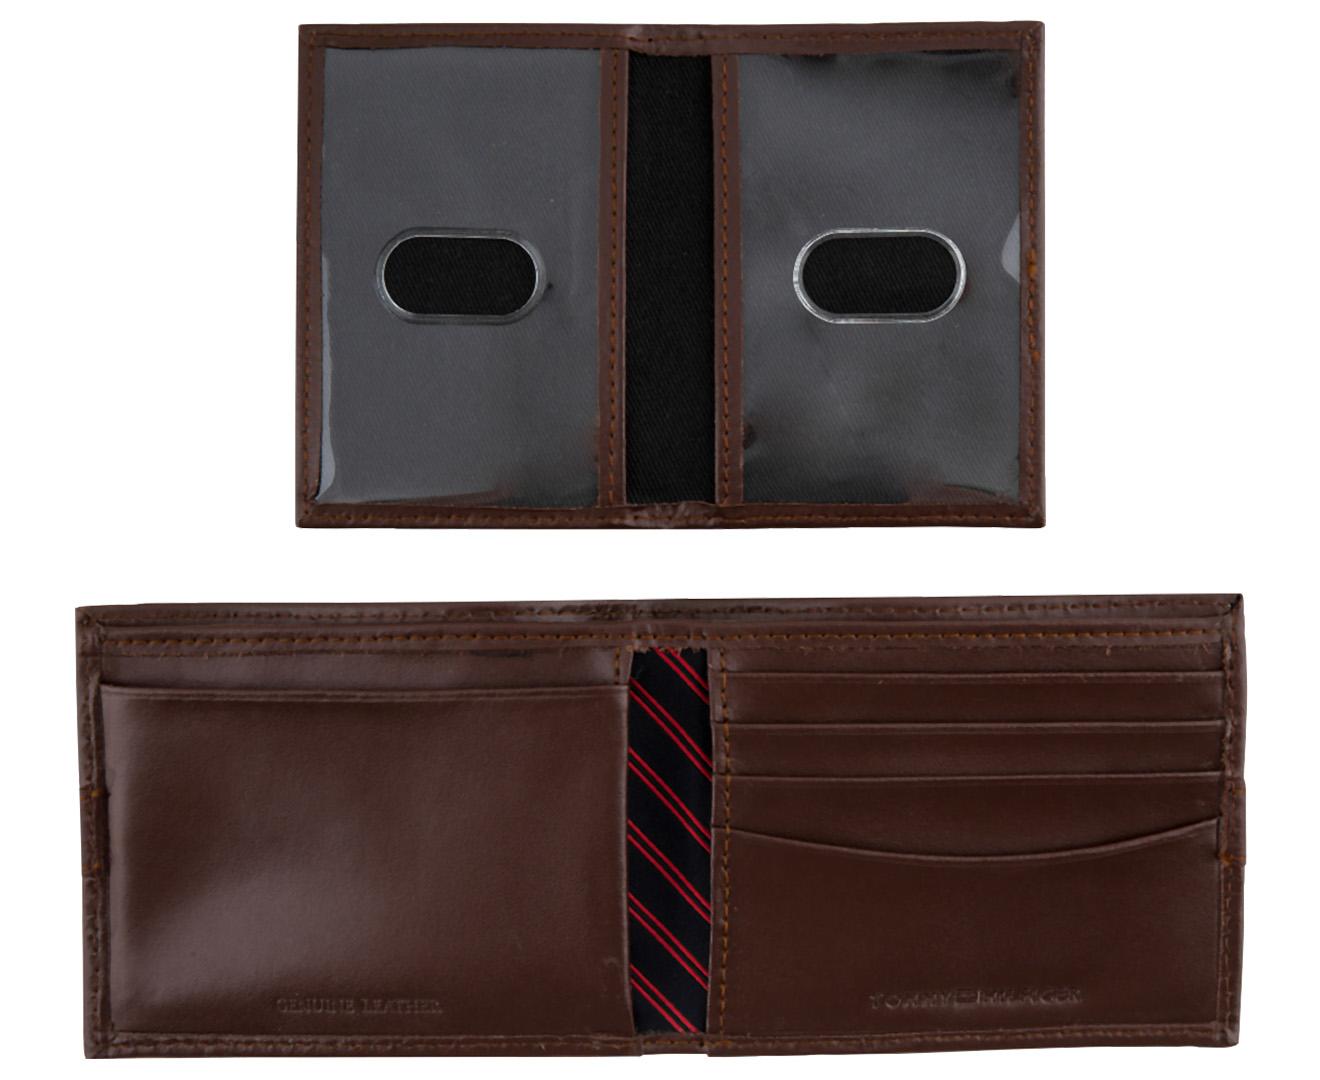 Tommy Hilfiger Ranger Passcase Billfold Wallet